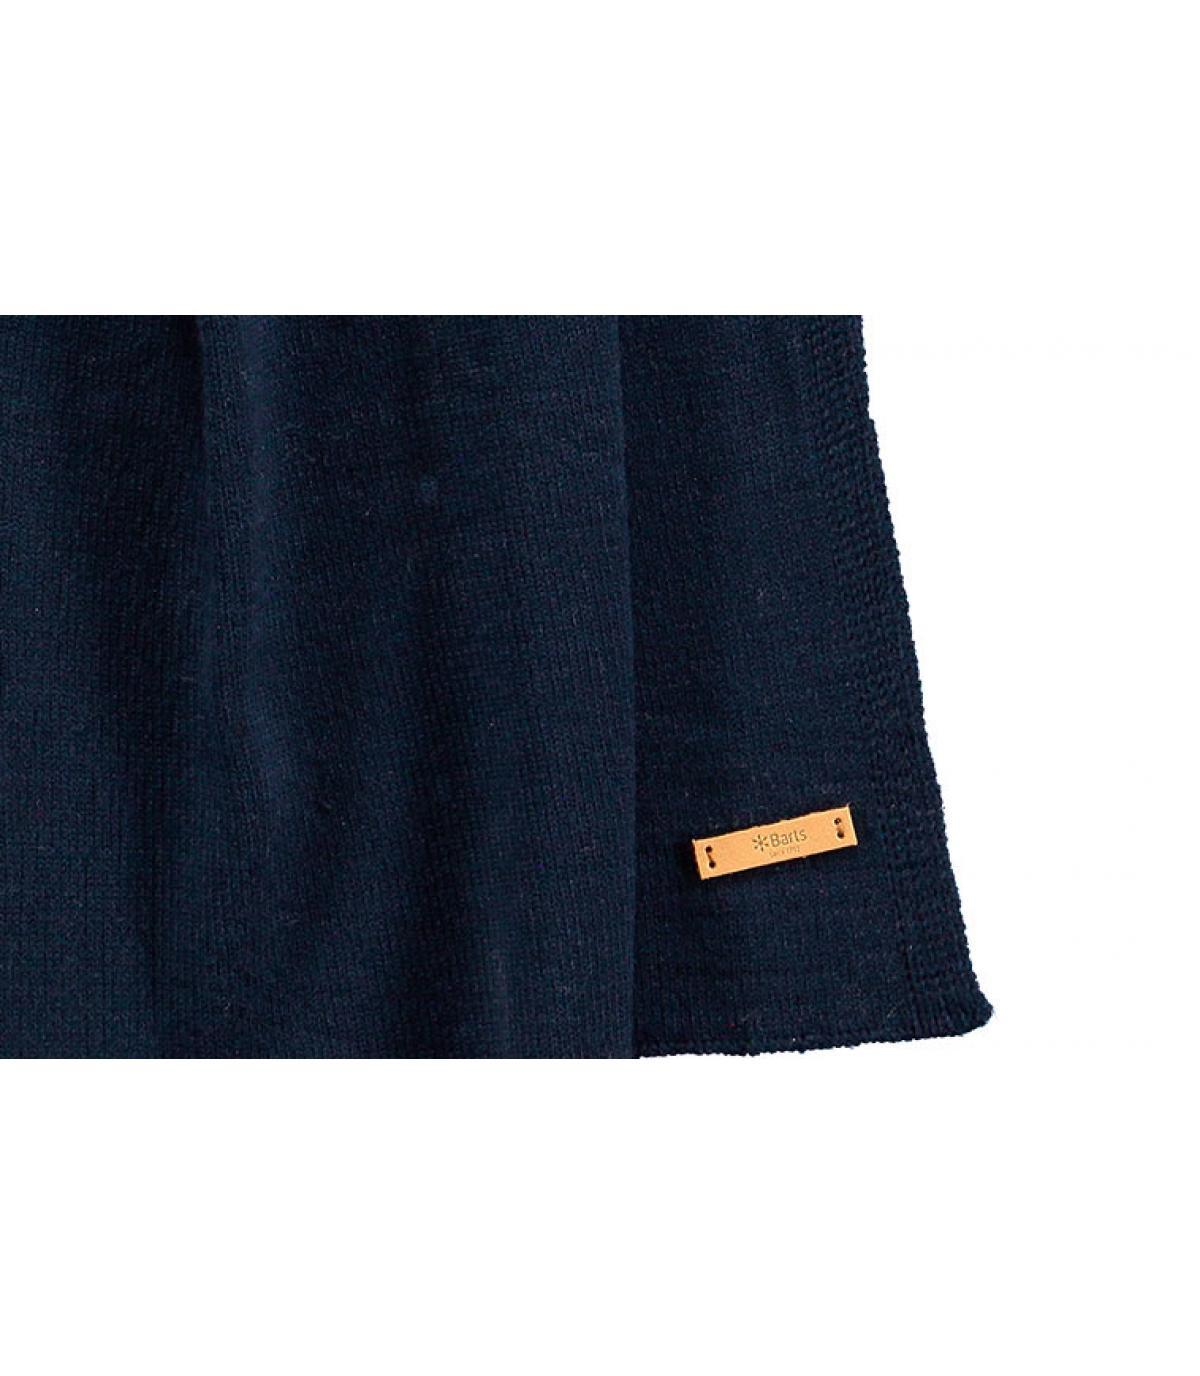 Schal einfarbig blau